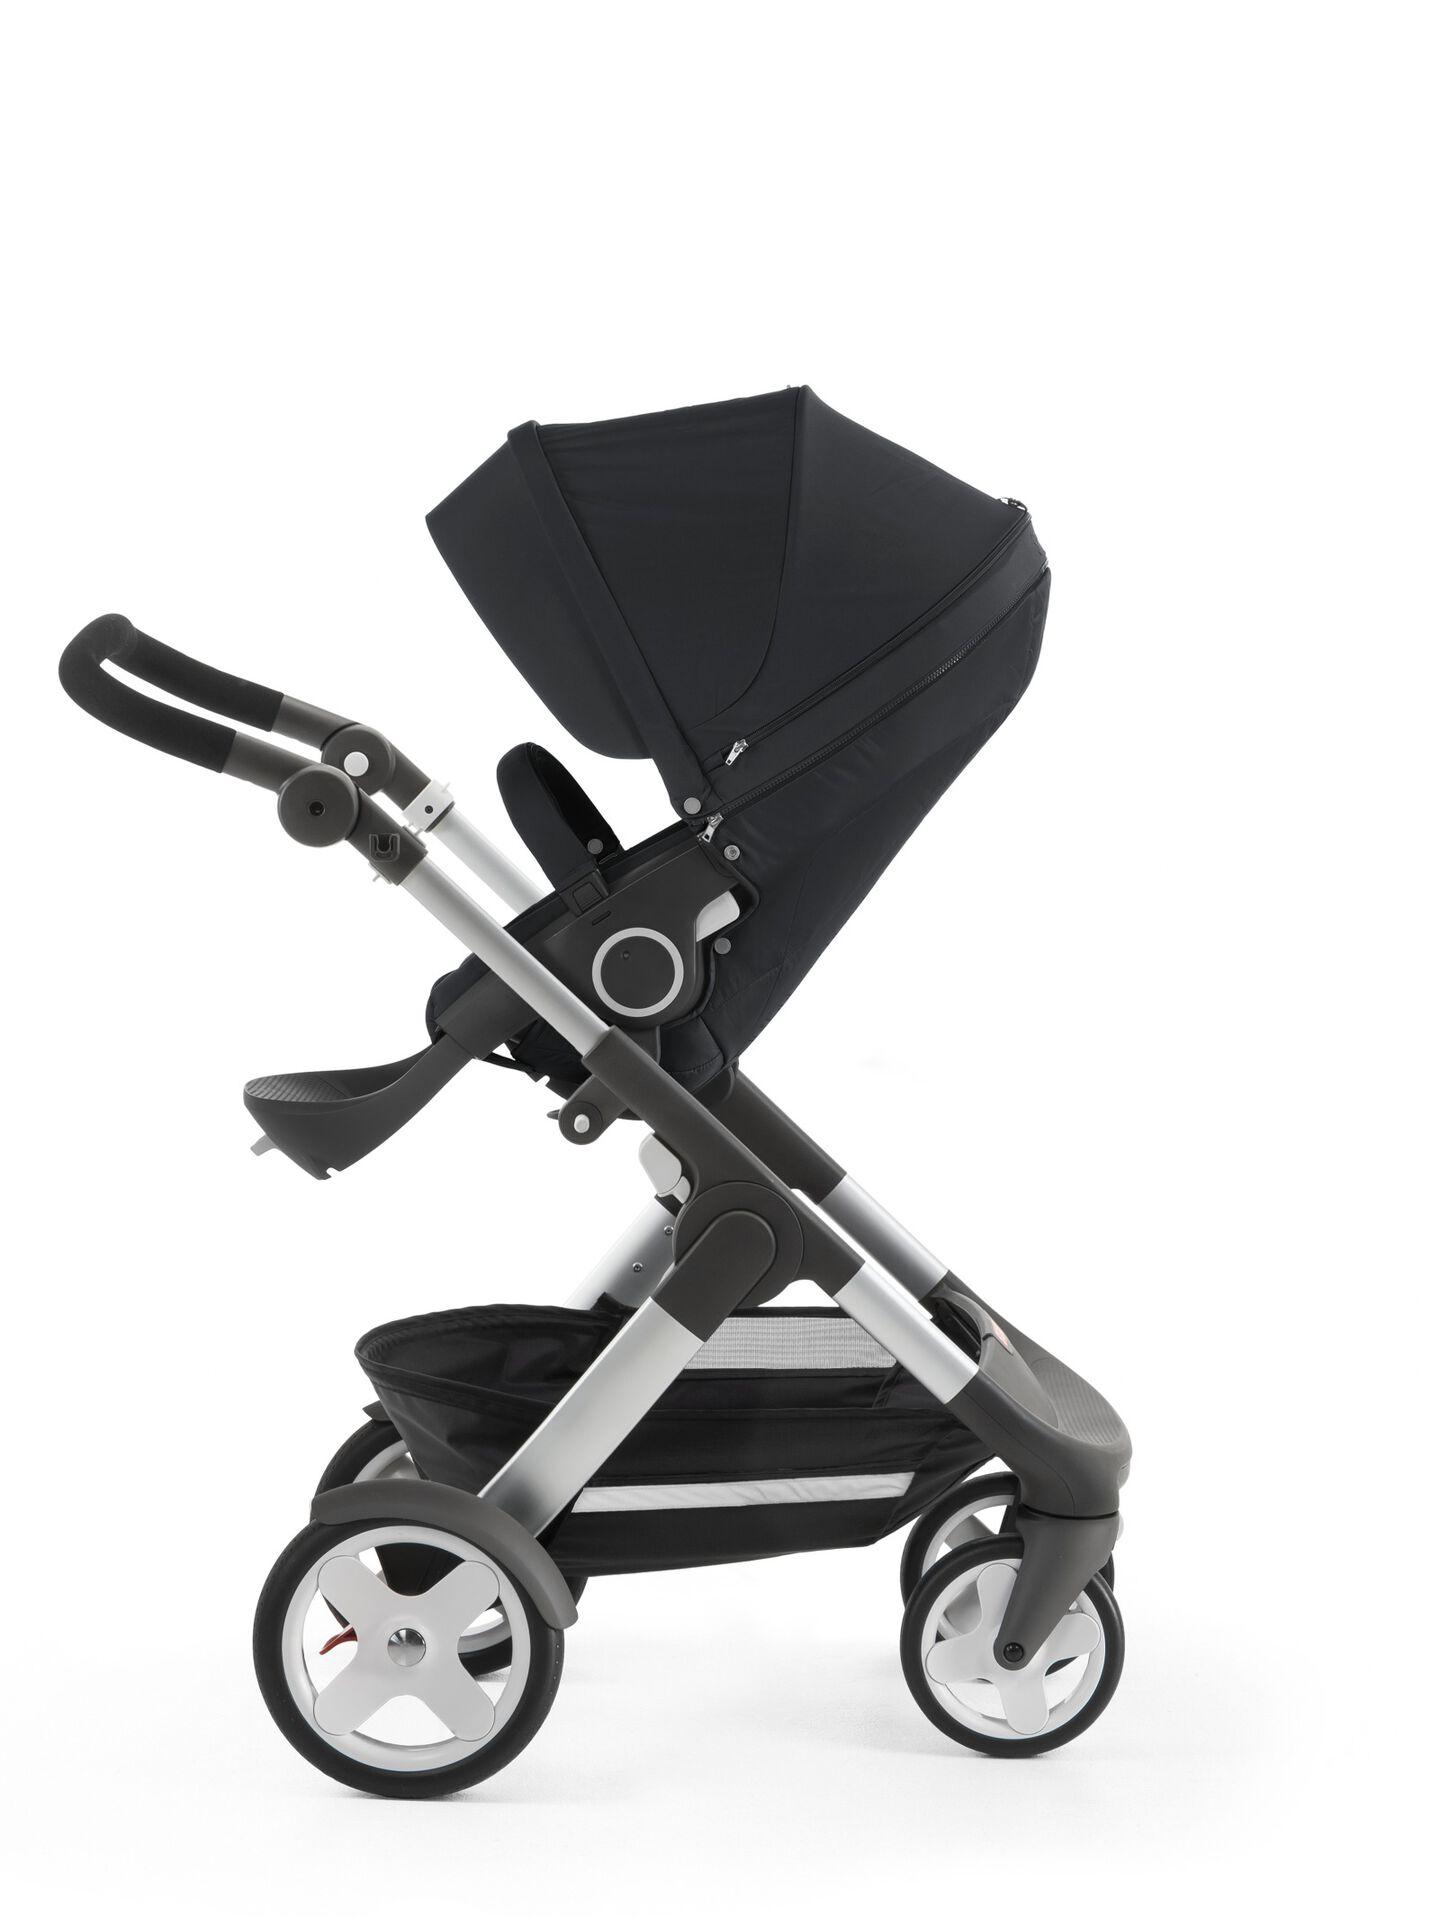 Stokke® Trailz™ with Stokke® Stroller Seat, Black. Classic Wheels.